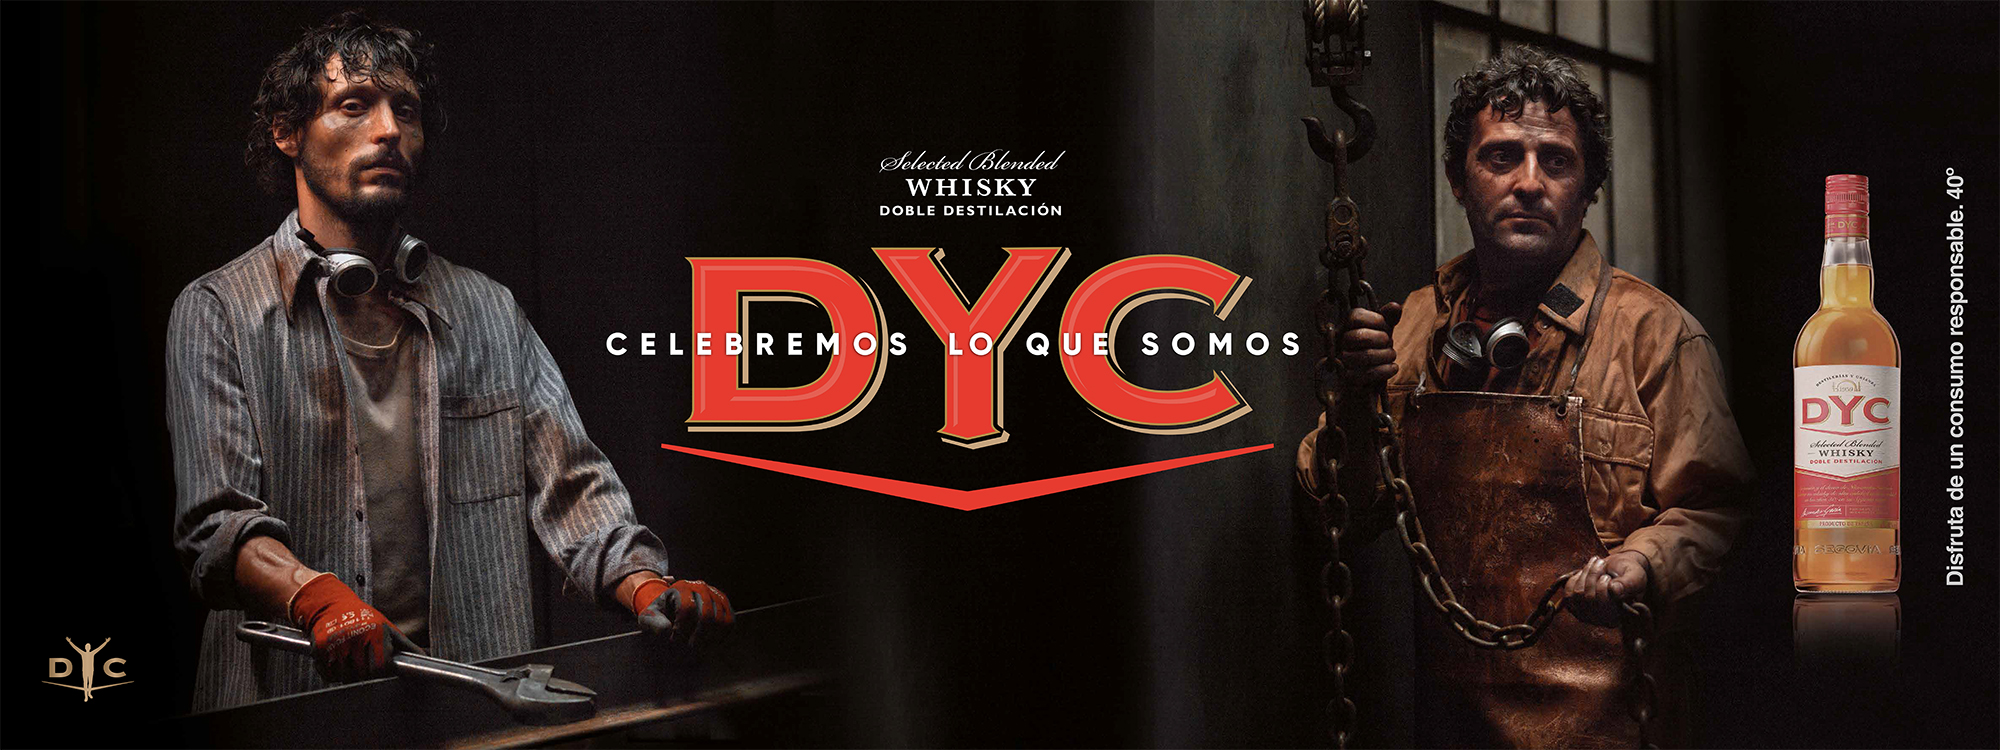 DYC Nueva Campaña Comunicación 2